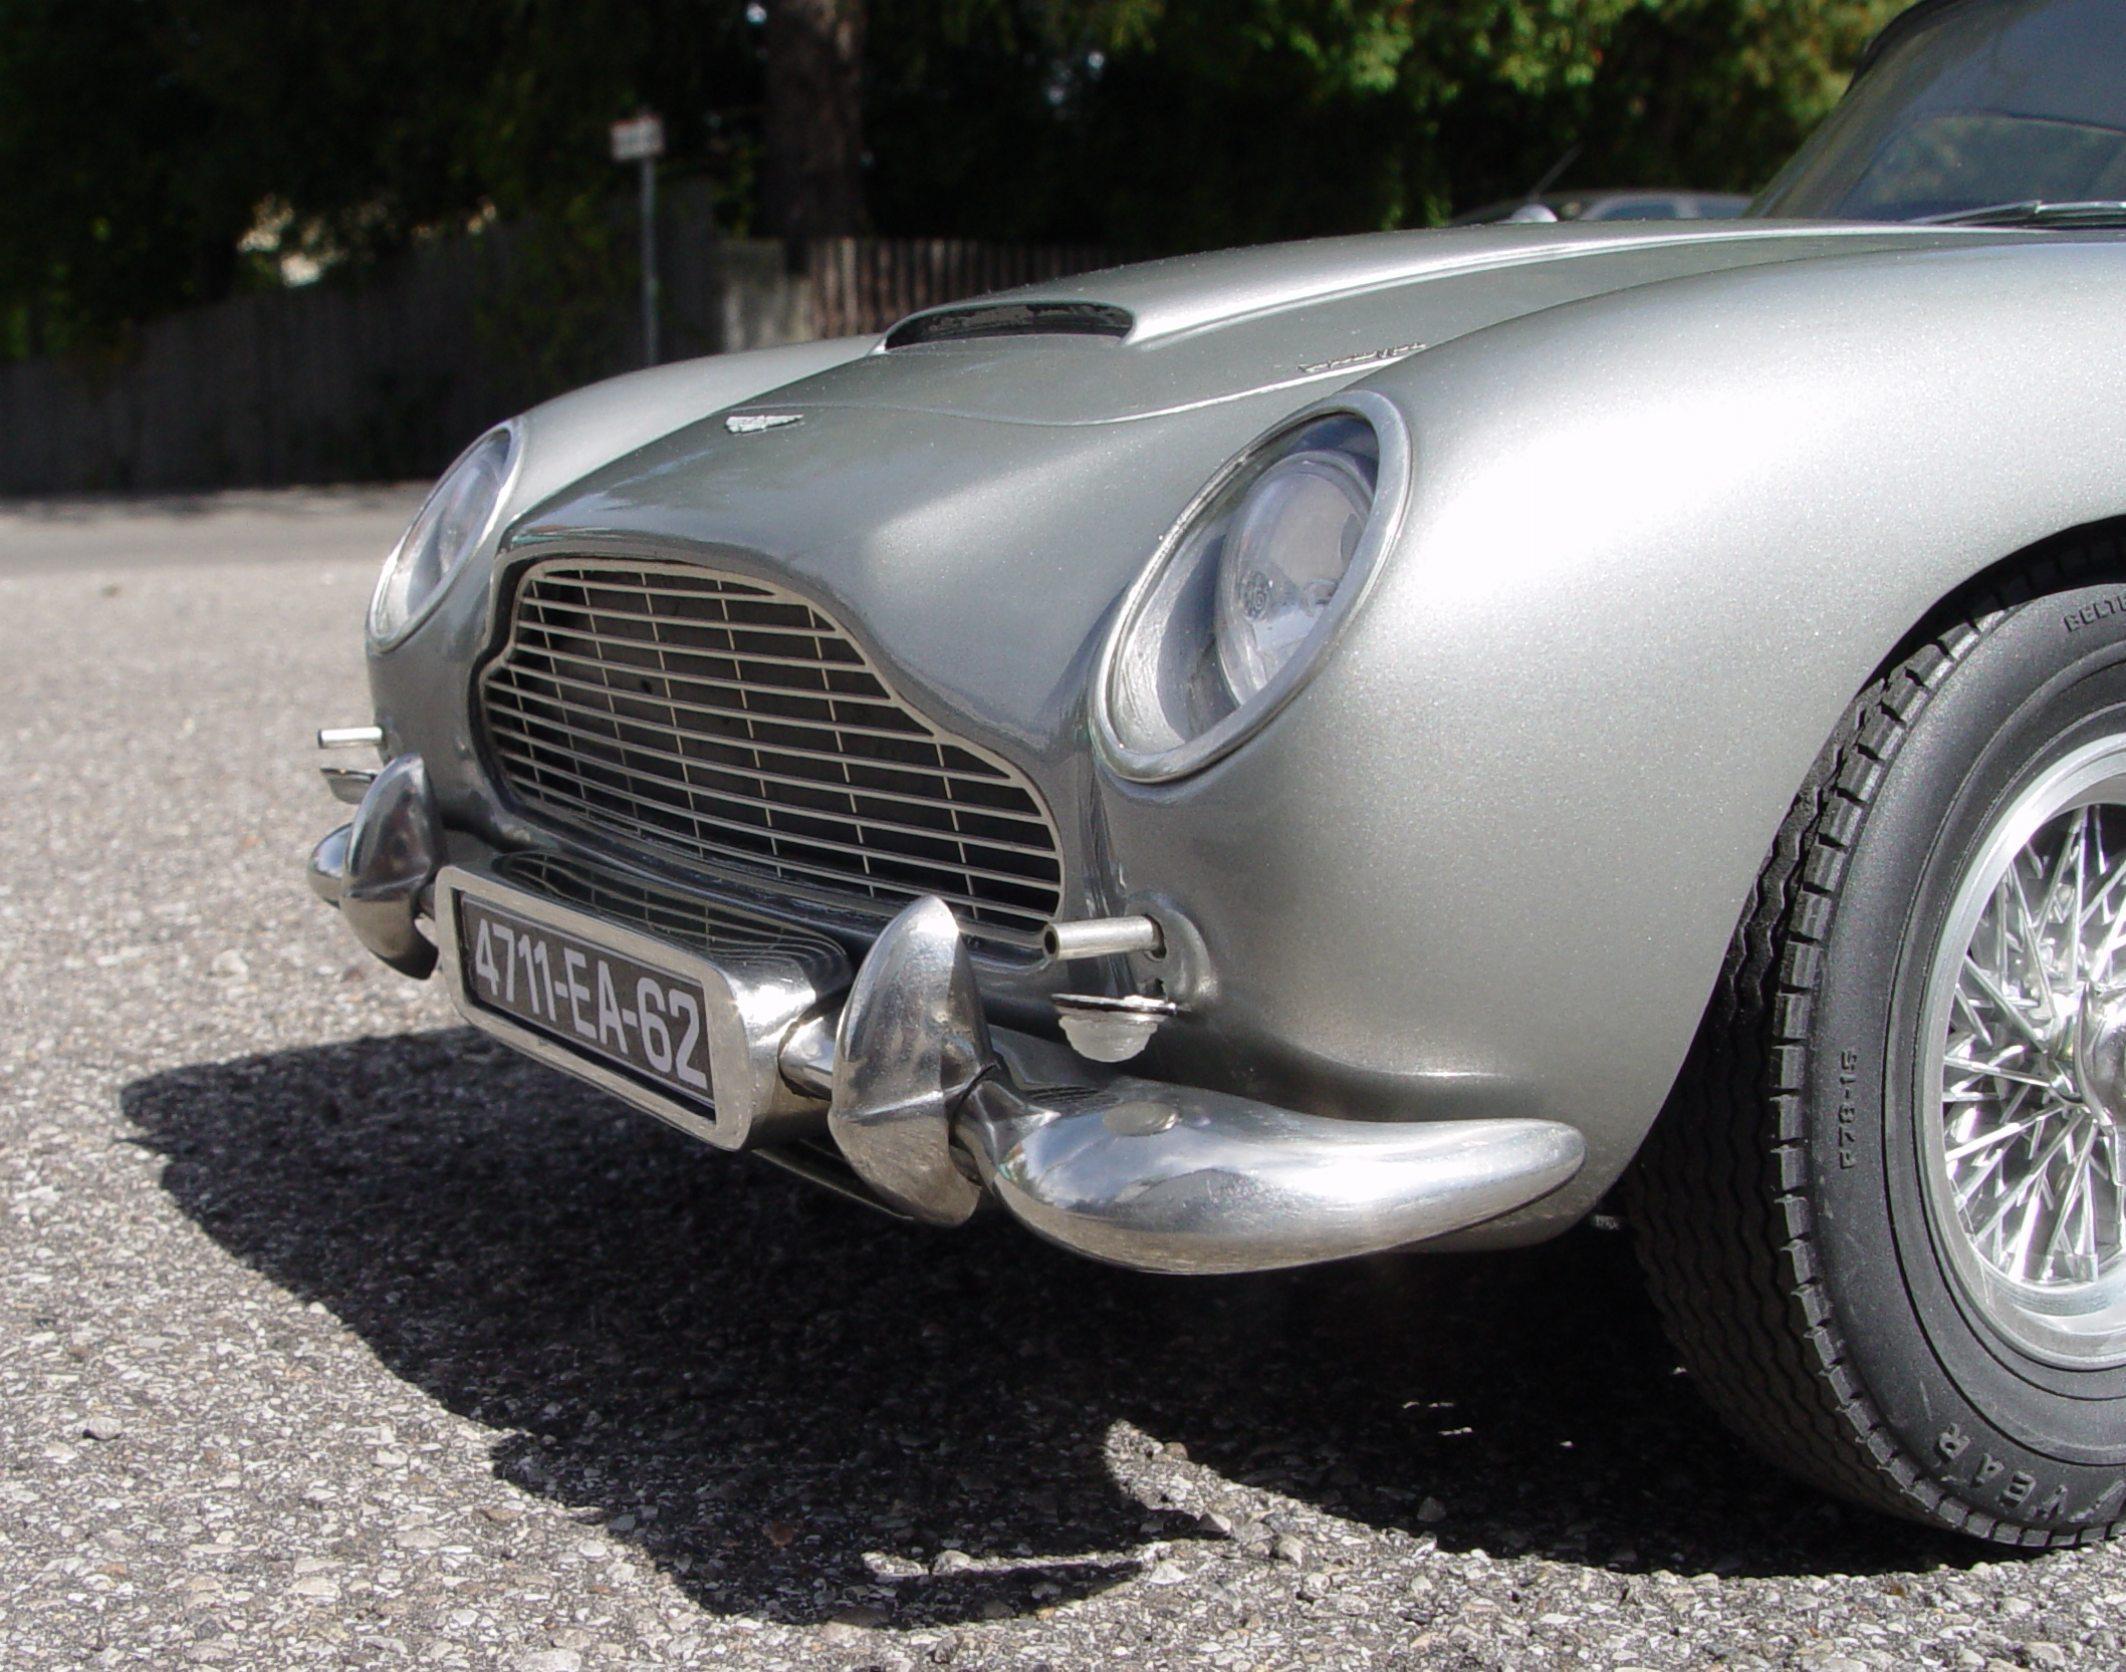 Aston Martin DB5 JB 007 1:8 - Page 2 1-8_Aston_Martin_James_Bond_Diamond_Cars_MG01